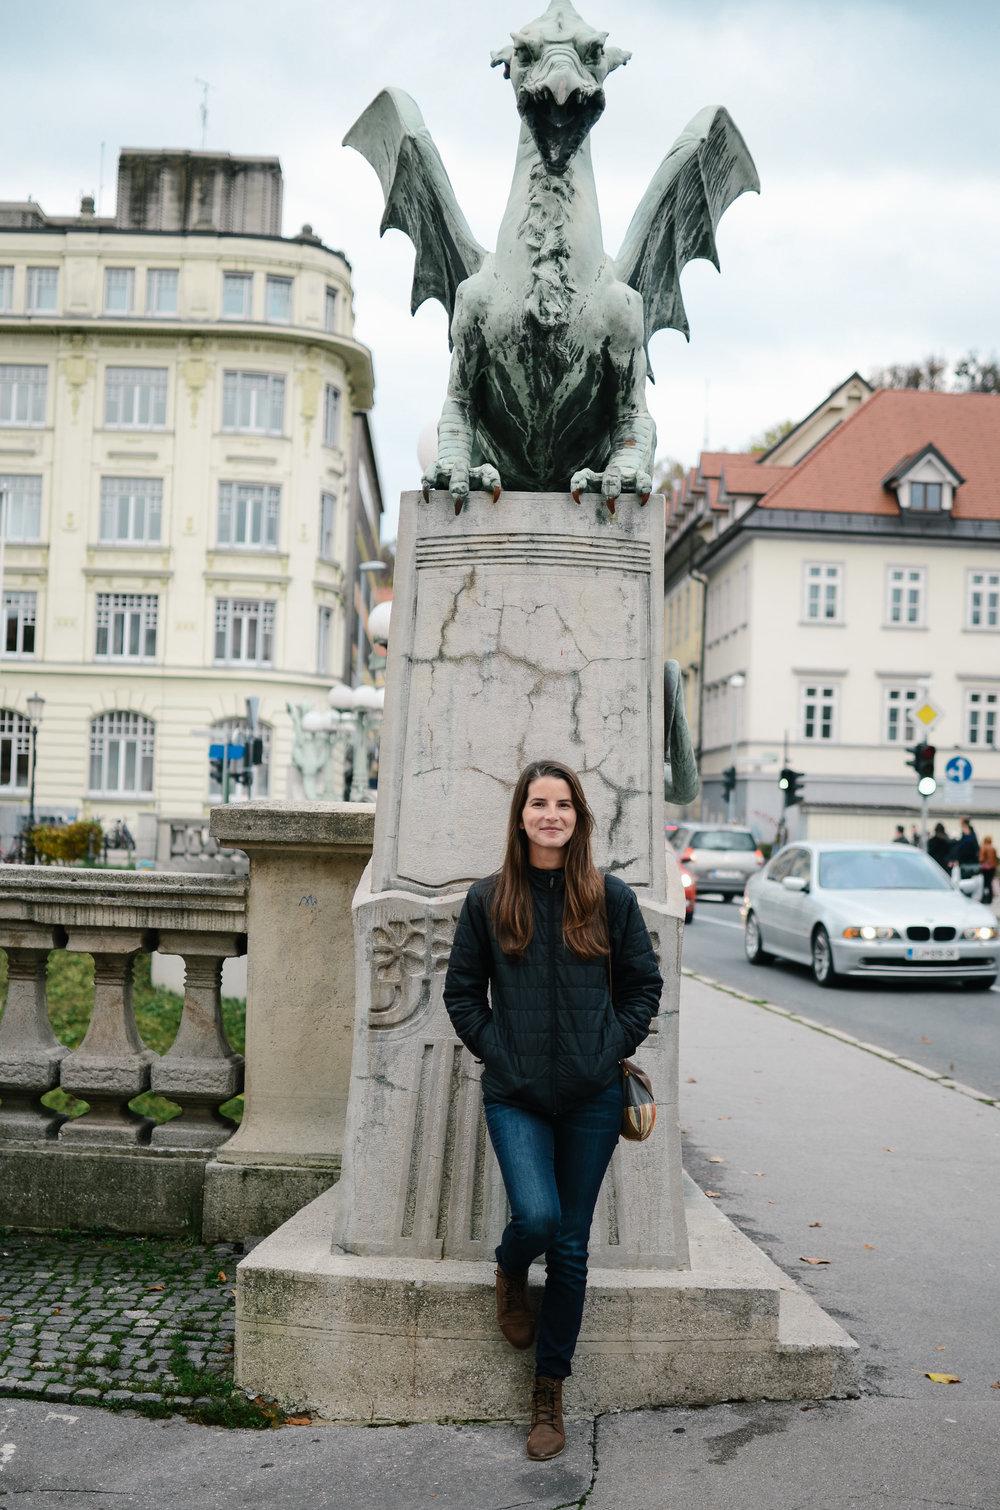 ljubljana-slovenia-travel-guide-lifeonpine_DSC_1827.jpg